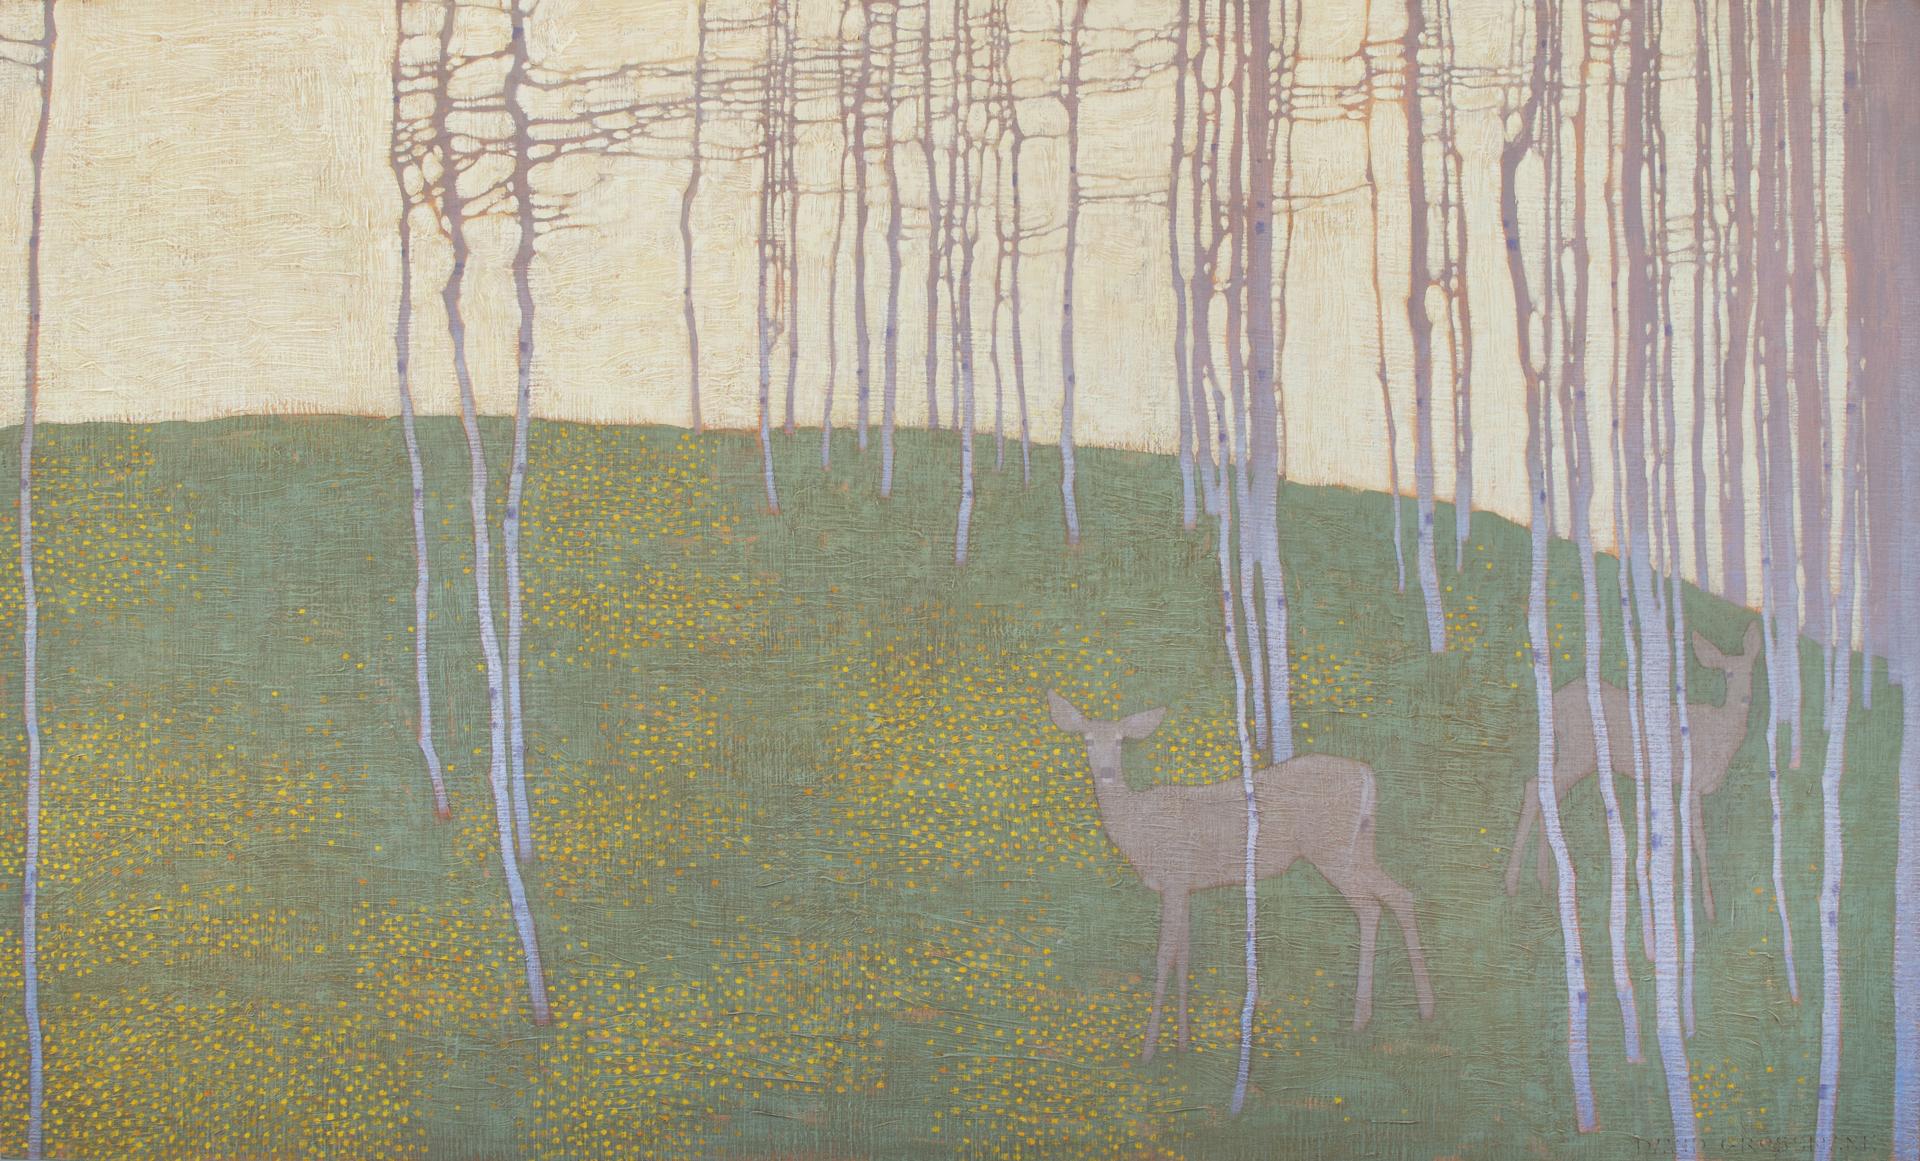 Summer Forest Patterns by David Grossmann